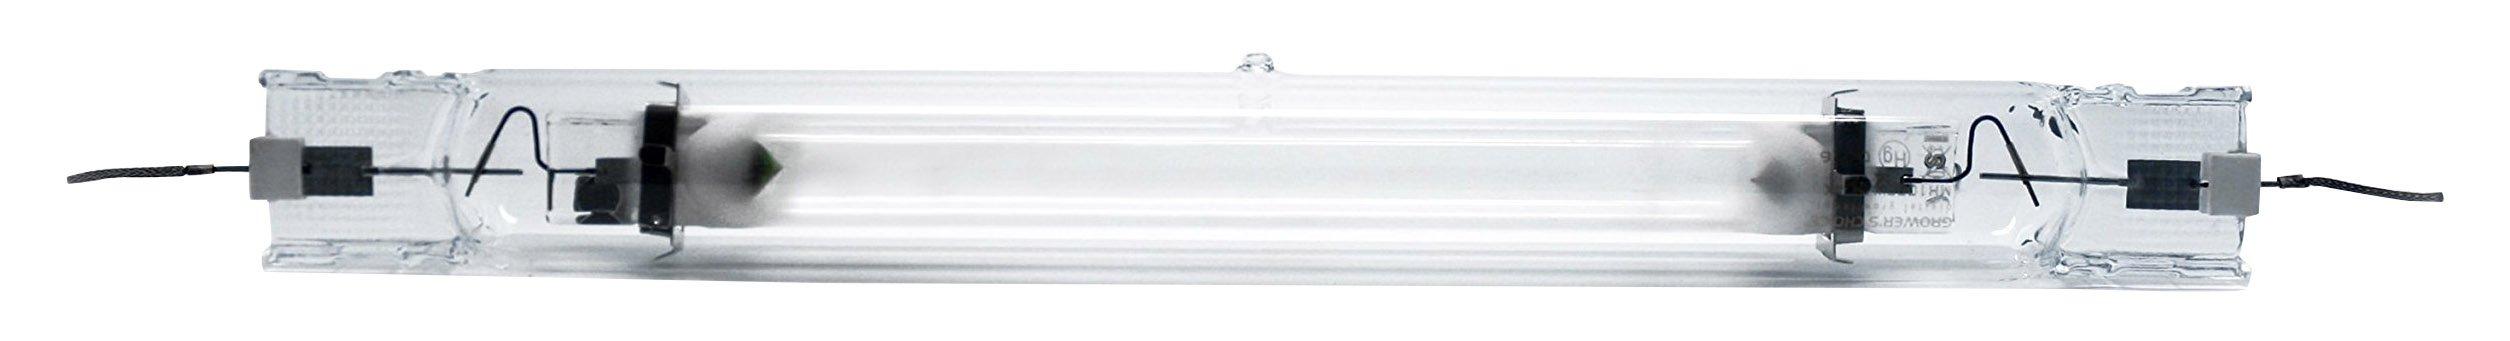 Grower's Choice DE MH Double Ended Metal Halide Grow Light Lamp (6K), 1000W